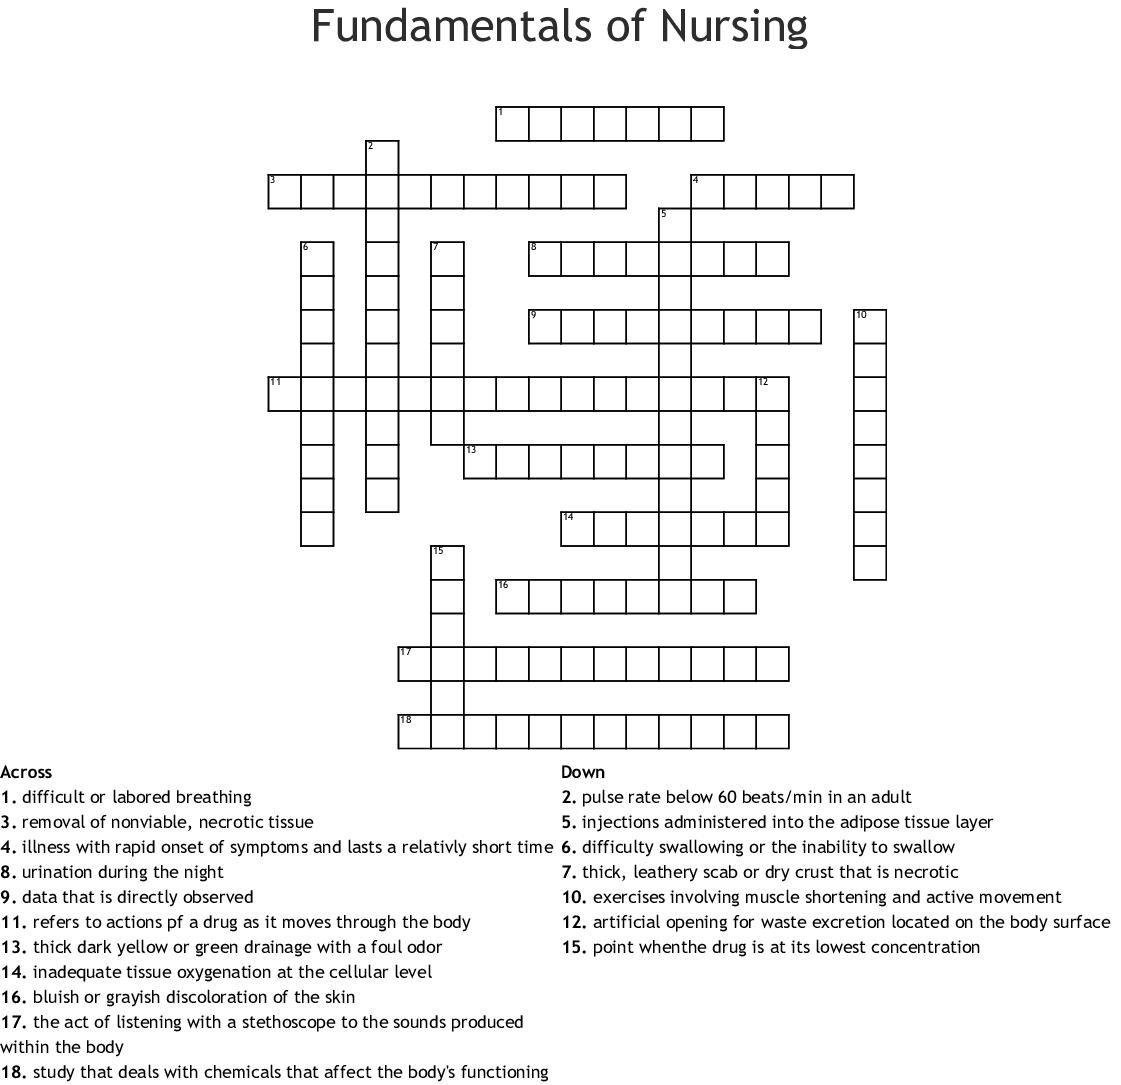 Fundamentals Of Nursing Crossword - Wordmint - Printable Nursing Crossword Puzzles